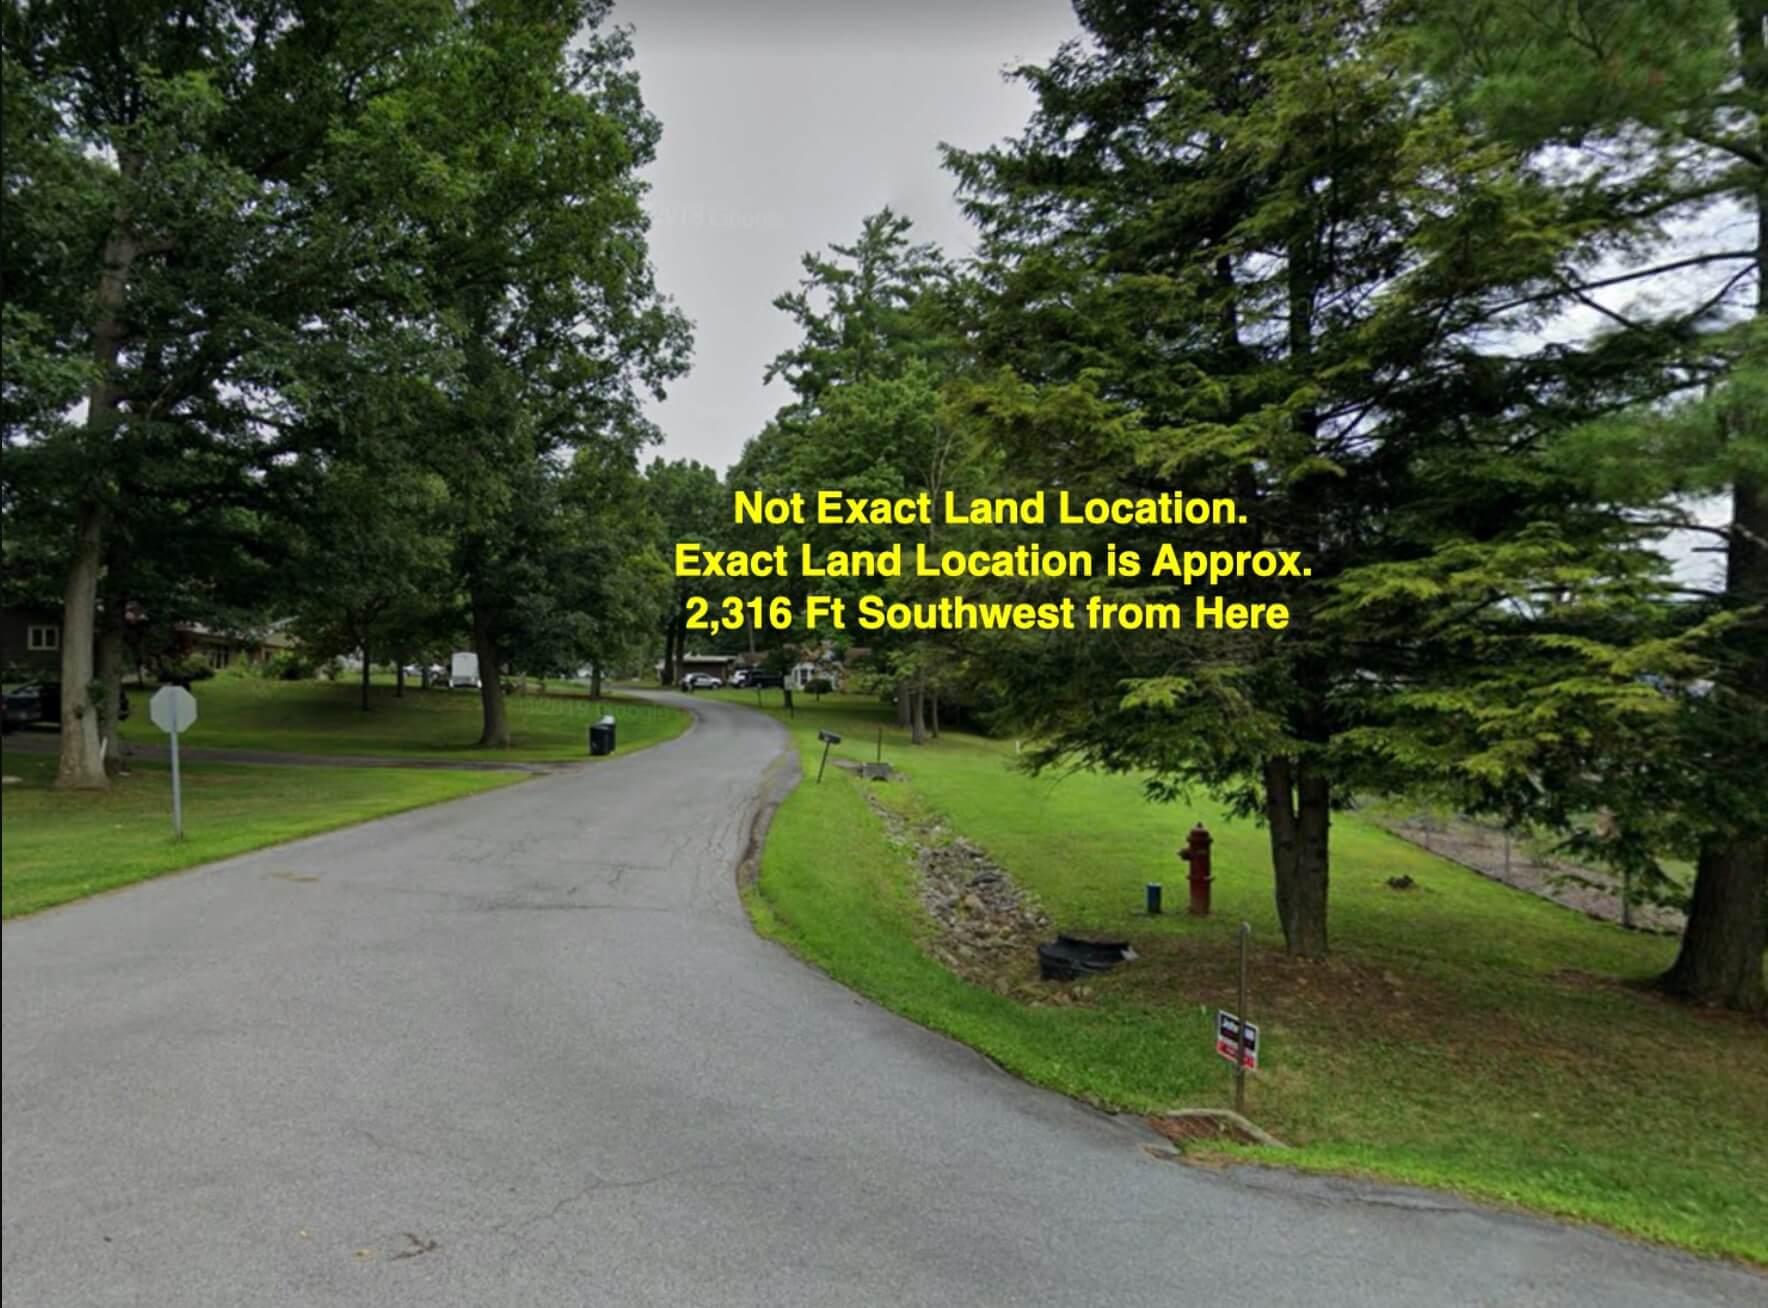 Cheap Land in Altoona, PA- Population 40K+ Altoona, PA Land Lot